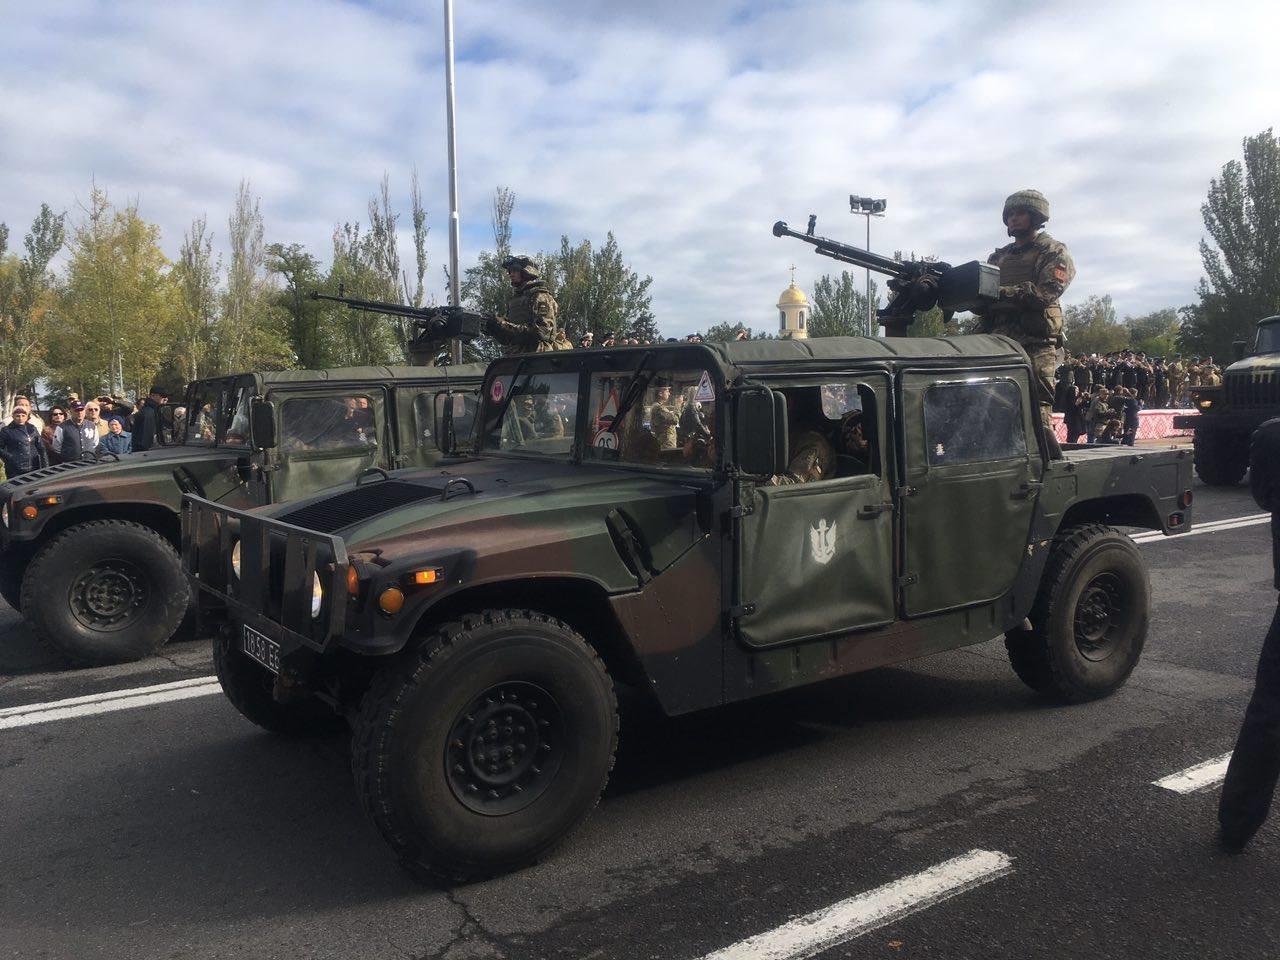 Wer beschoss ukrainisches Militärfahrzeug im Donbass? Zweifel an der Version Kiews